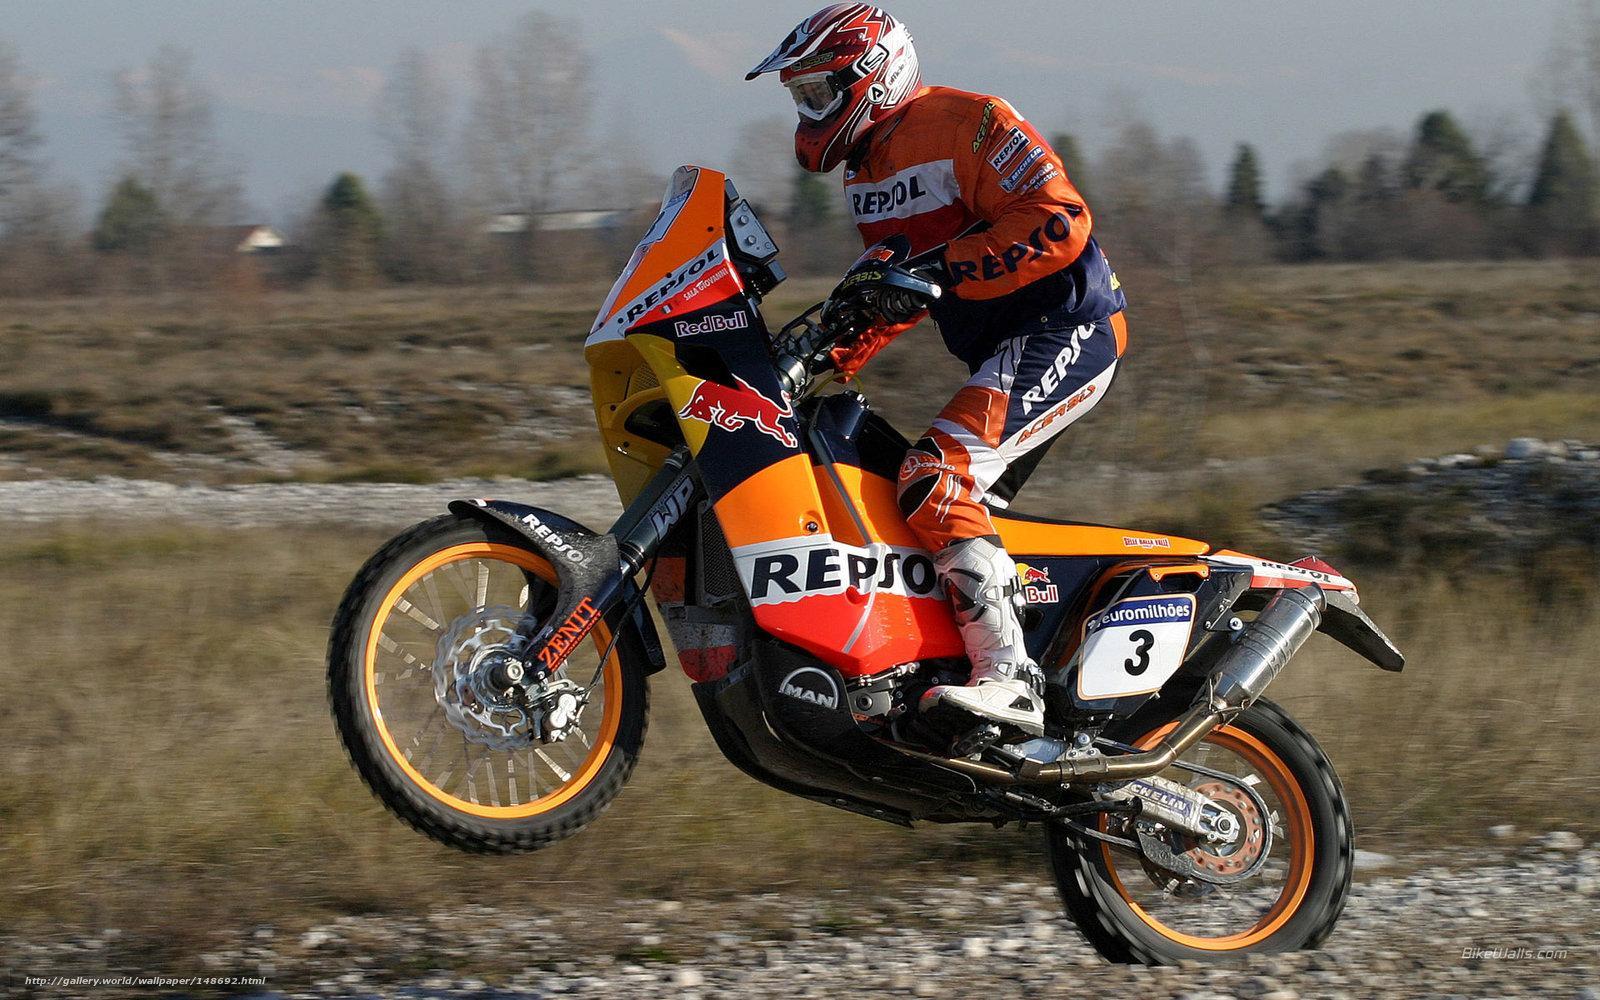 Tlcharger Fond d'ecran KTM, Aventure, 690 Rally, Rallye 690 2007 Fonds d'ecran gratuits pour ...